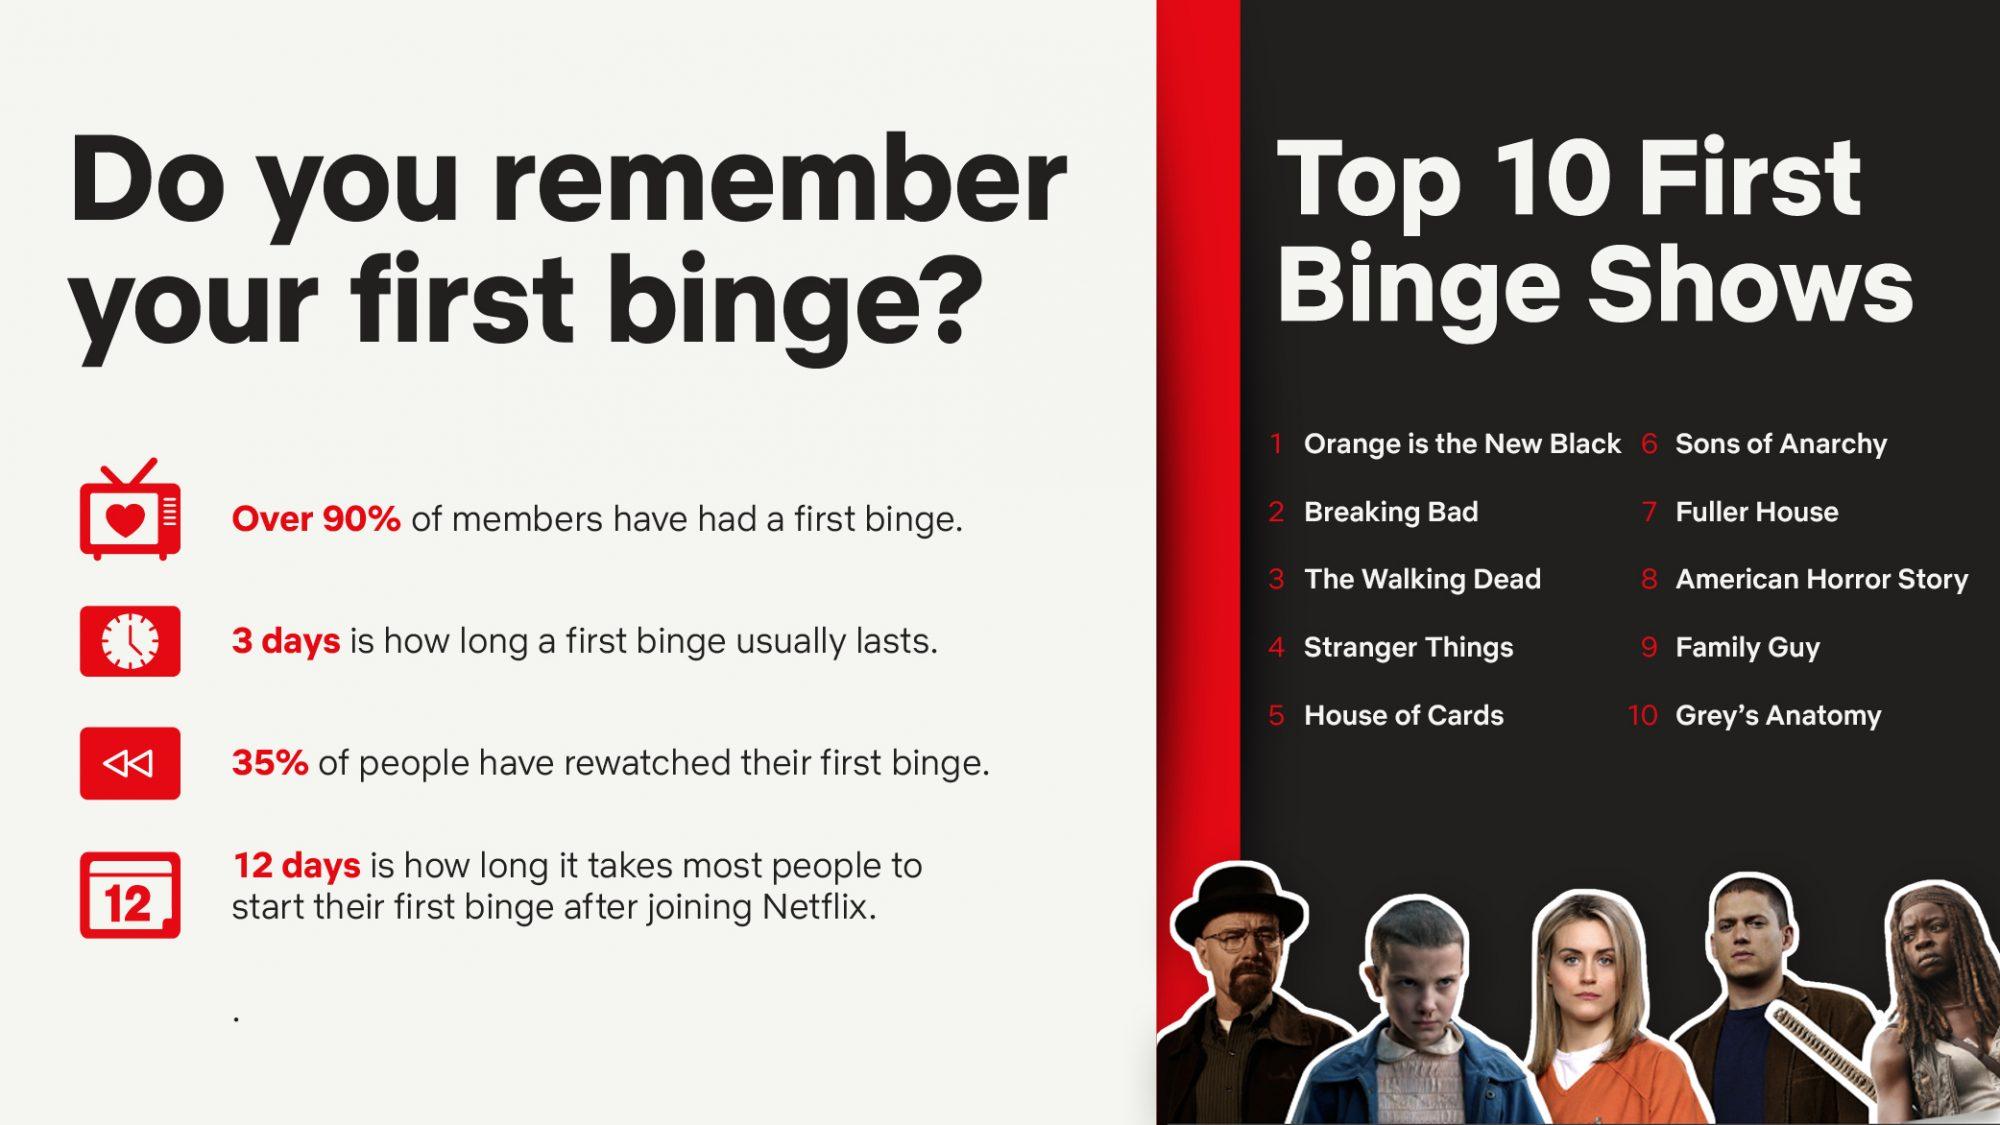 1-My-First-Binge-Infographic.jpg